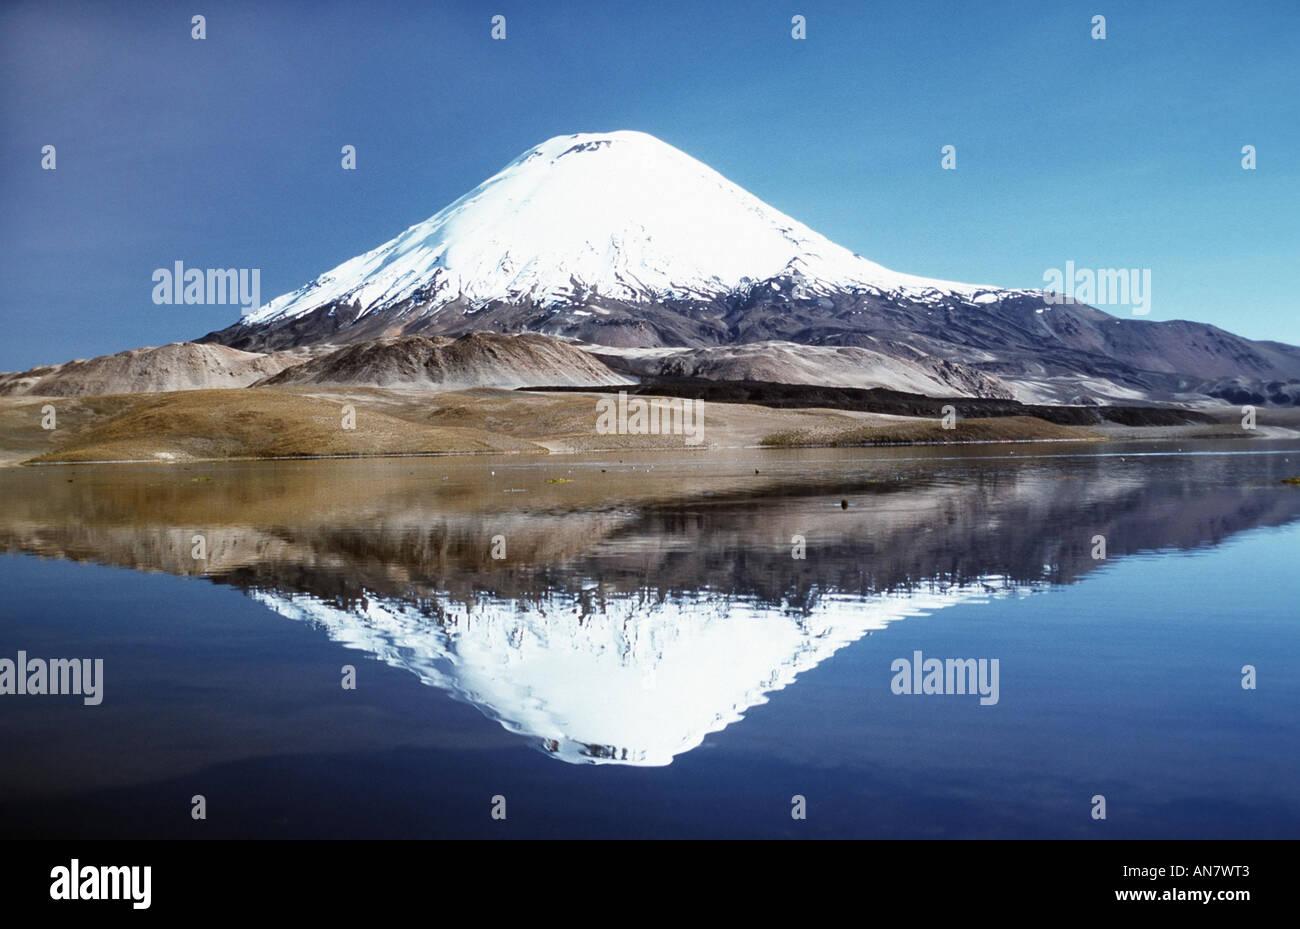 Volcano Parinacota, with reflexion mirror in Lago Chungara, Chile, Altiplano - Stock Image